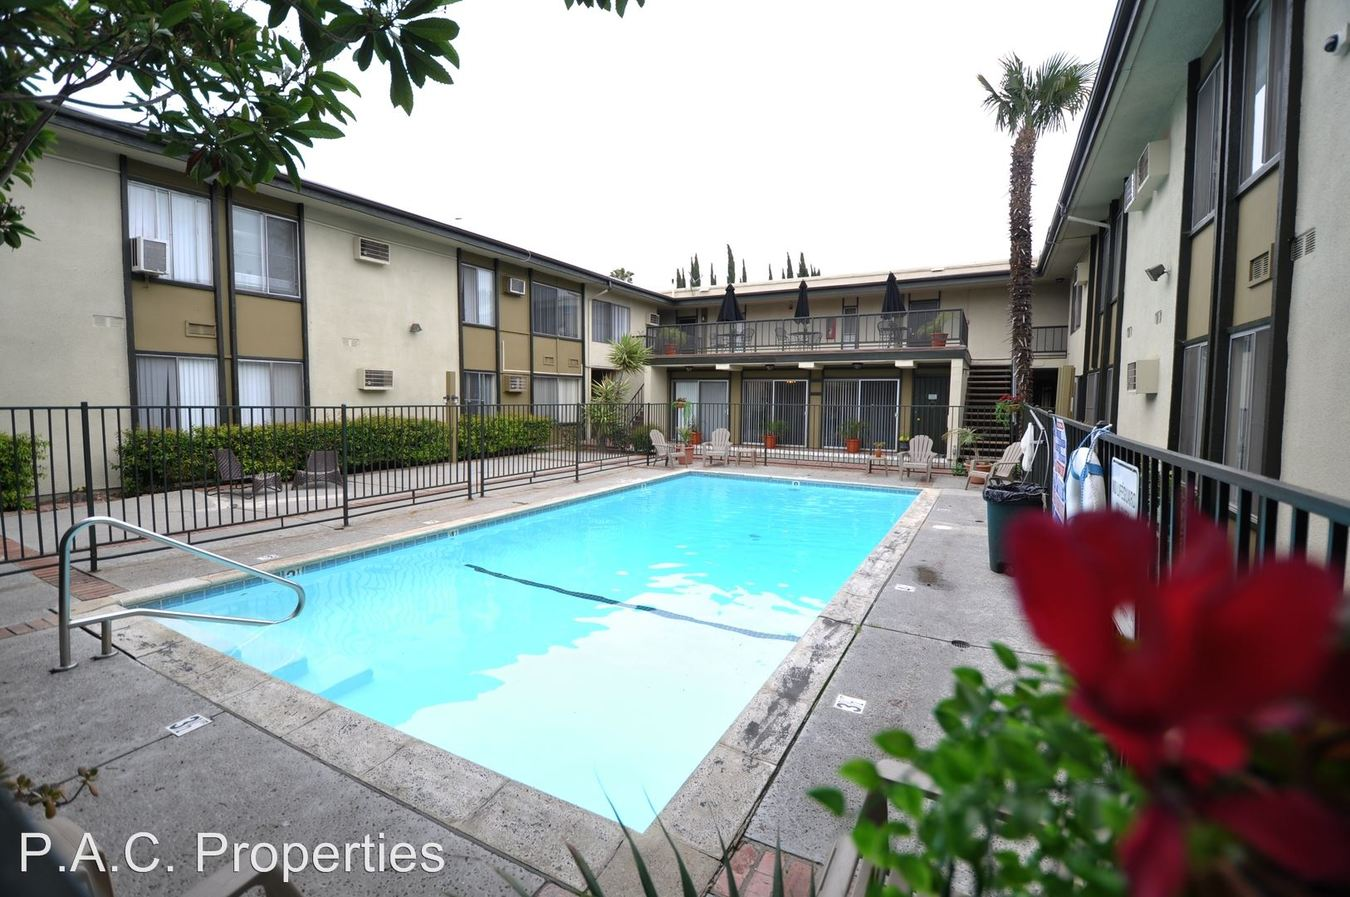 1 Bedroom 1 Bathroom Apartment for rent at 7350 Kester Avenue in Van Nuys, CA